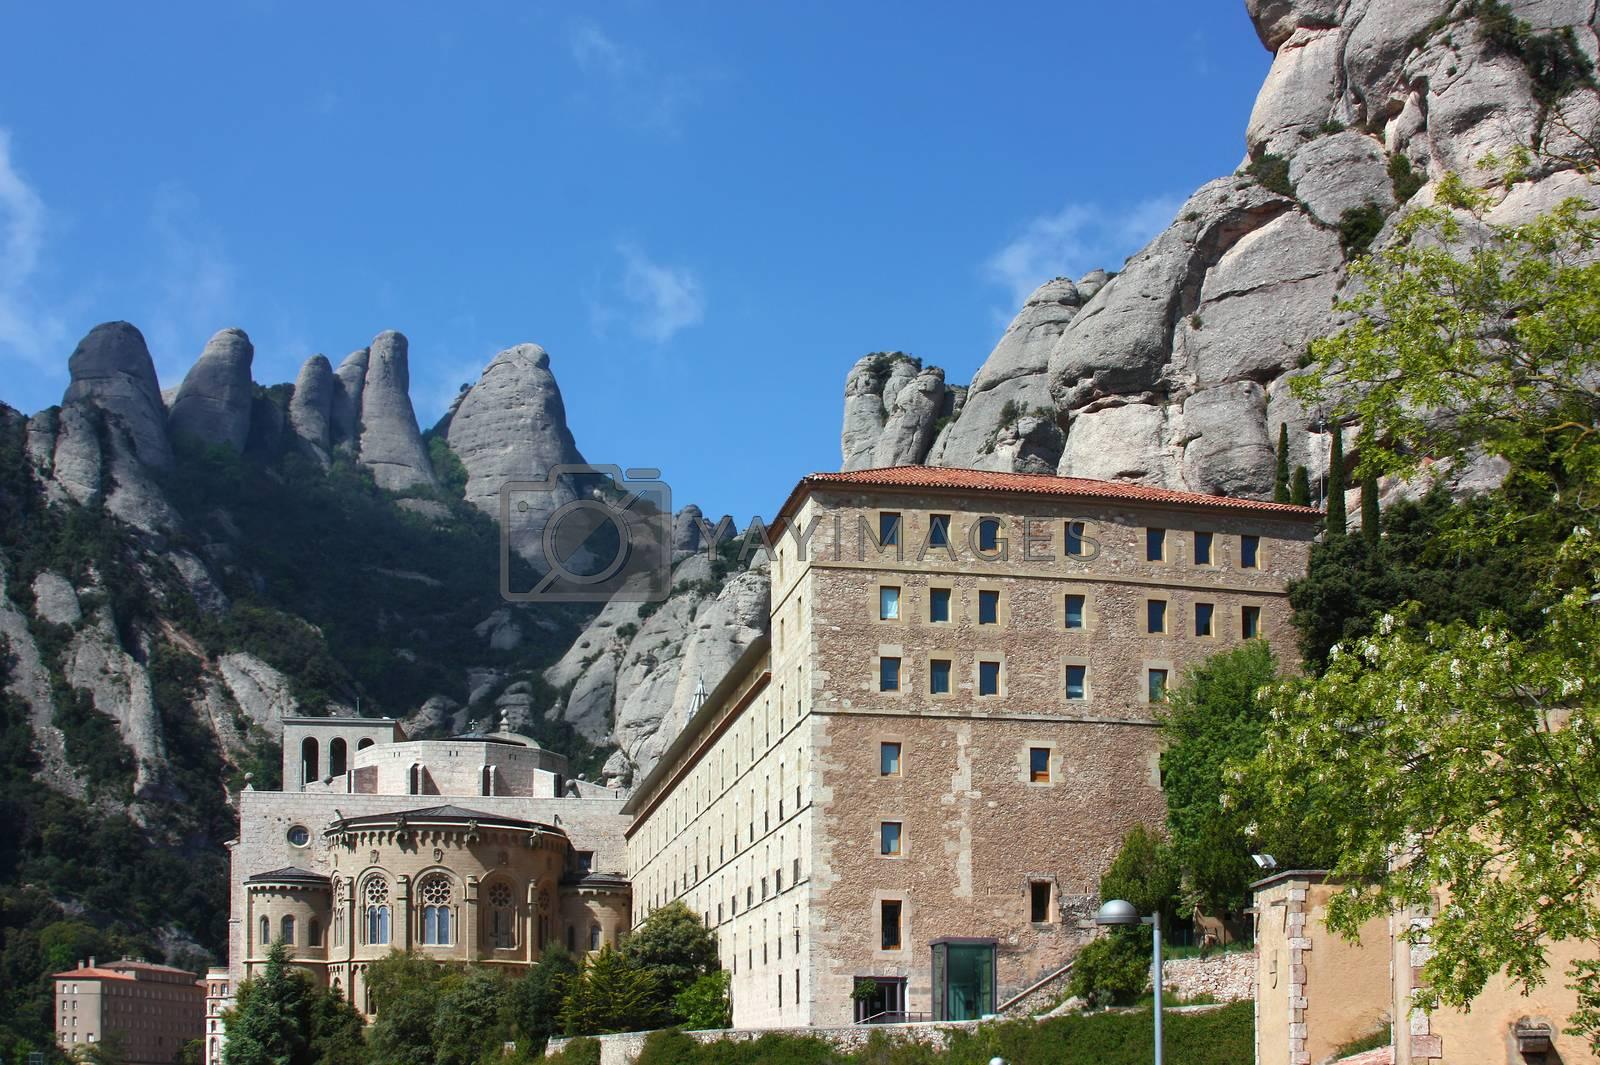 Abbey Santa Maria de Montserrat, Catalonia, Spain. by borisb17